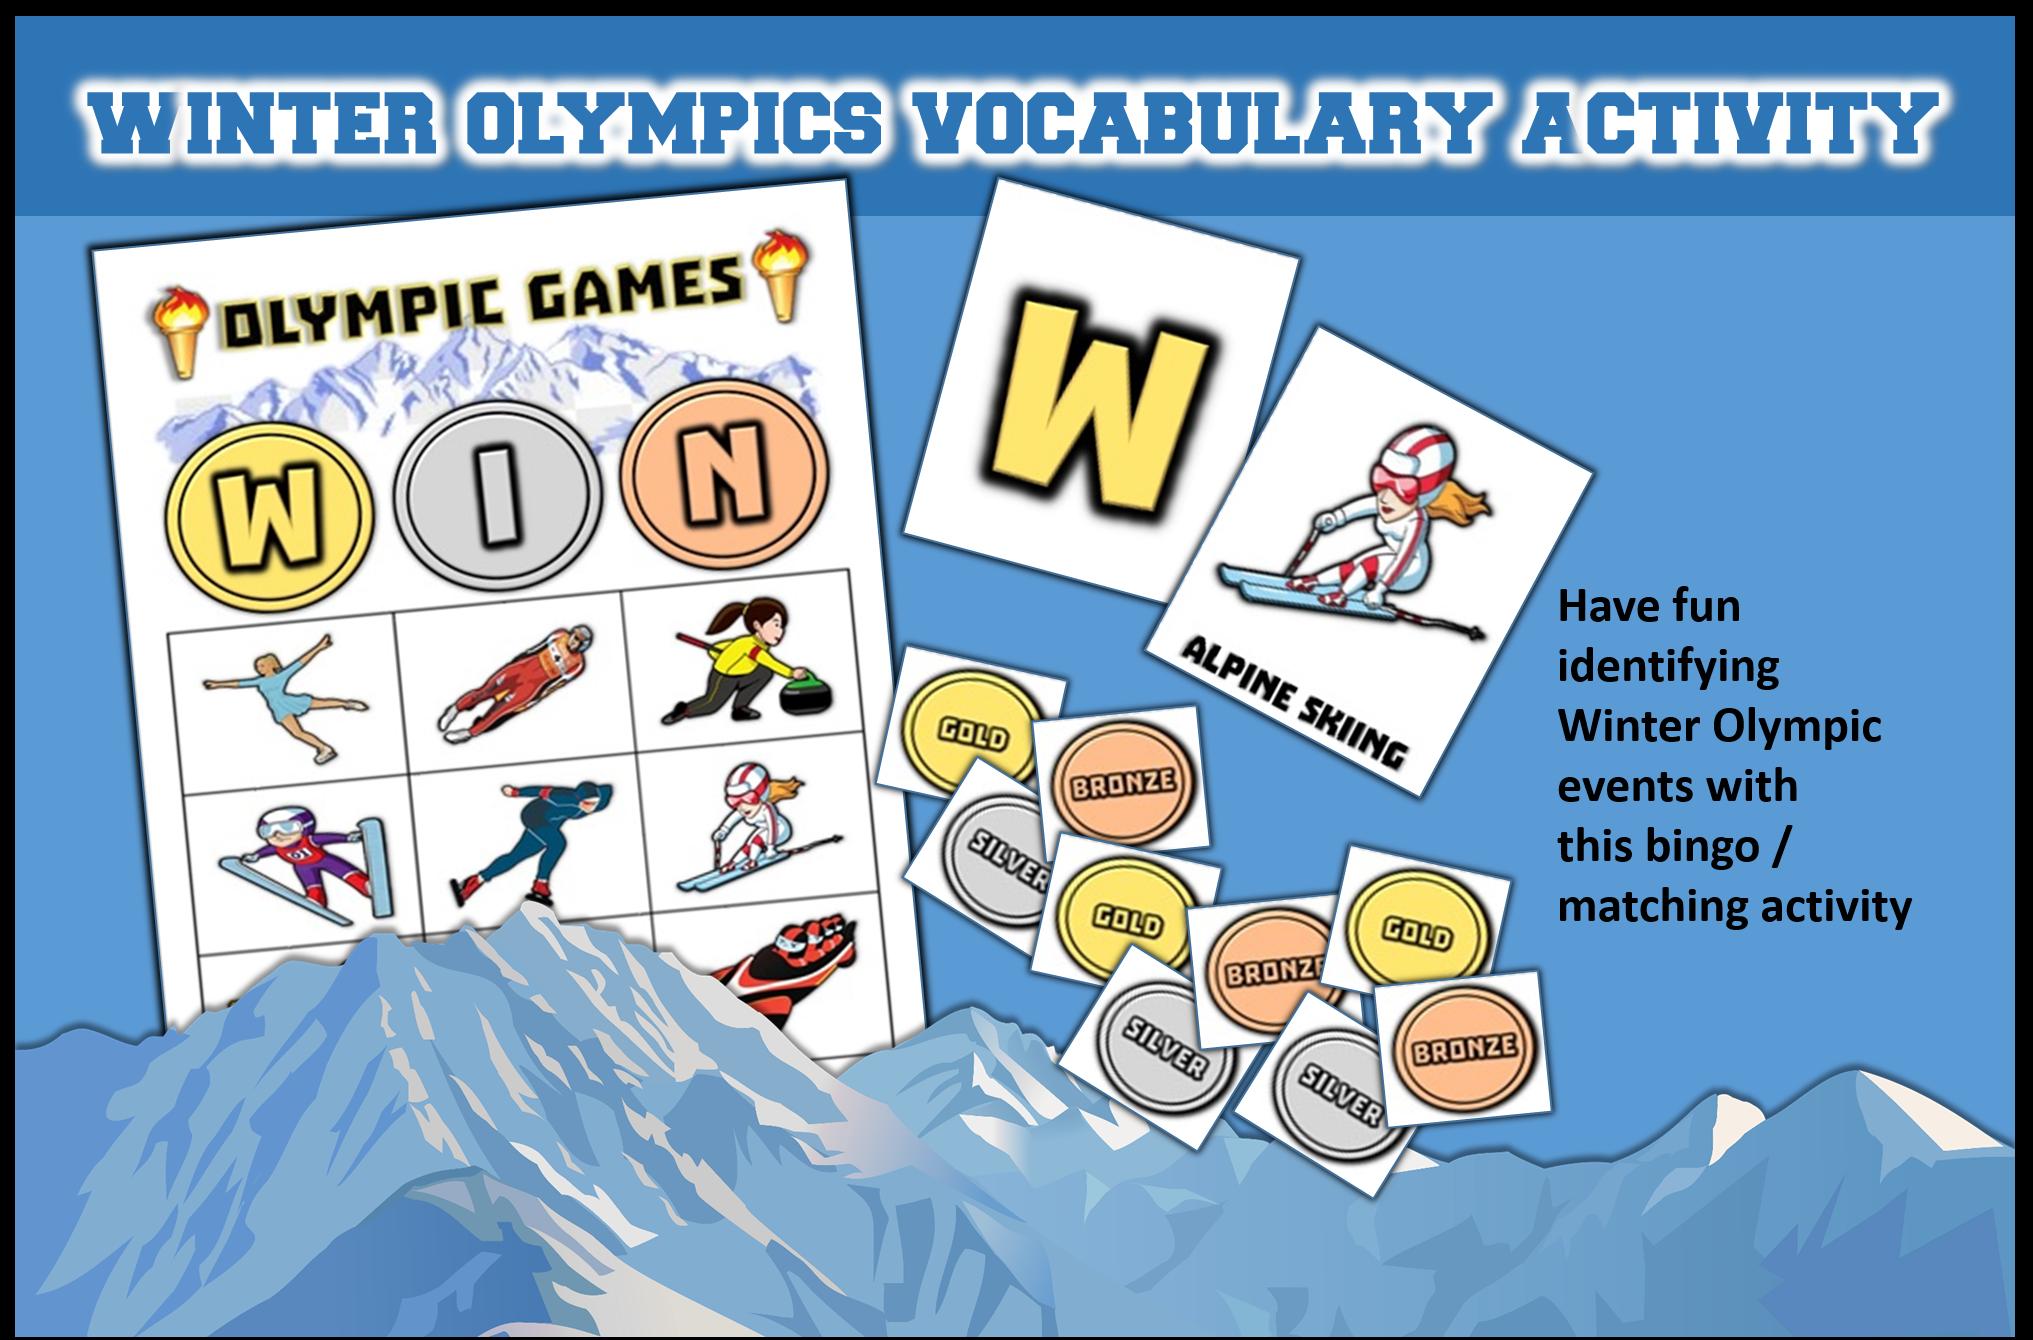 Winter Olympic Bingo Matching Activities